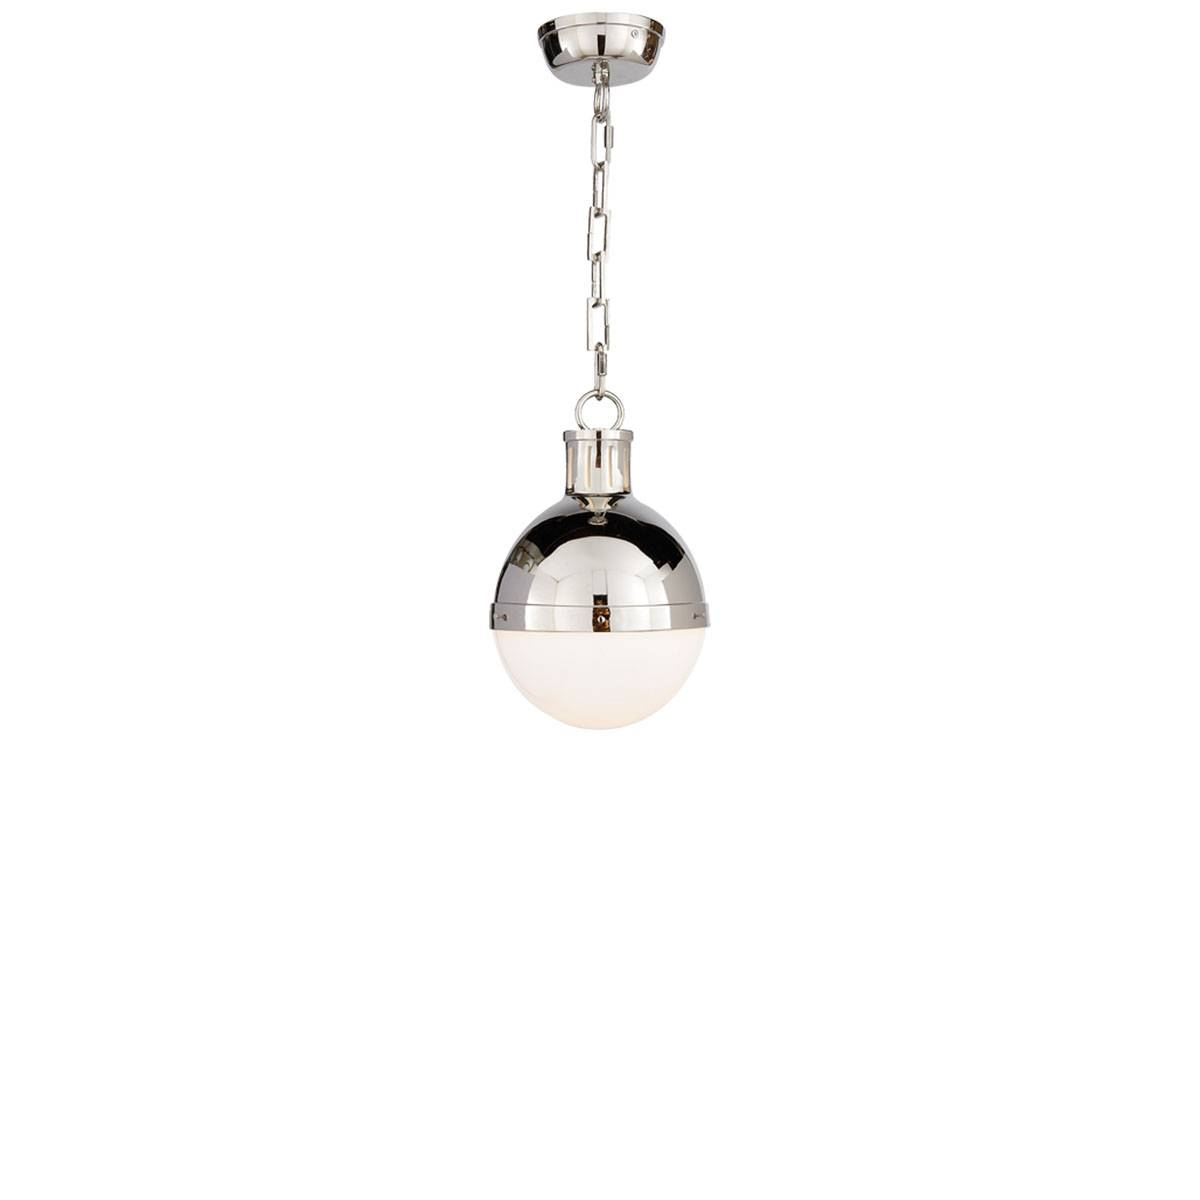 Visual Comfort Small Hicks Pendant, Pendant Fixture | Neenas Lighting within Small Hicks Pendants (Image 15 of 15)